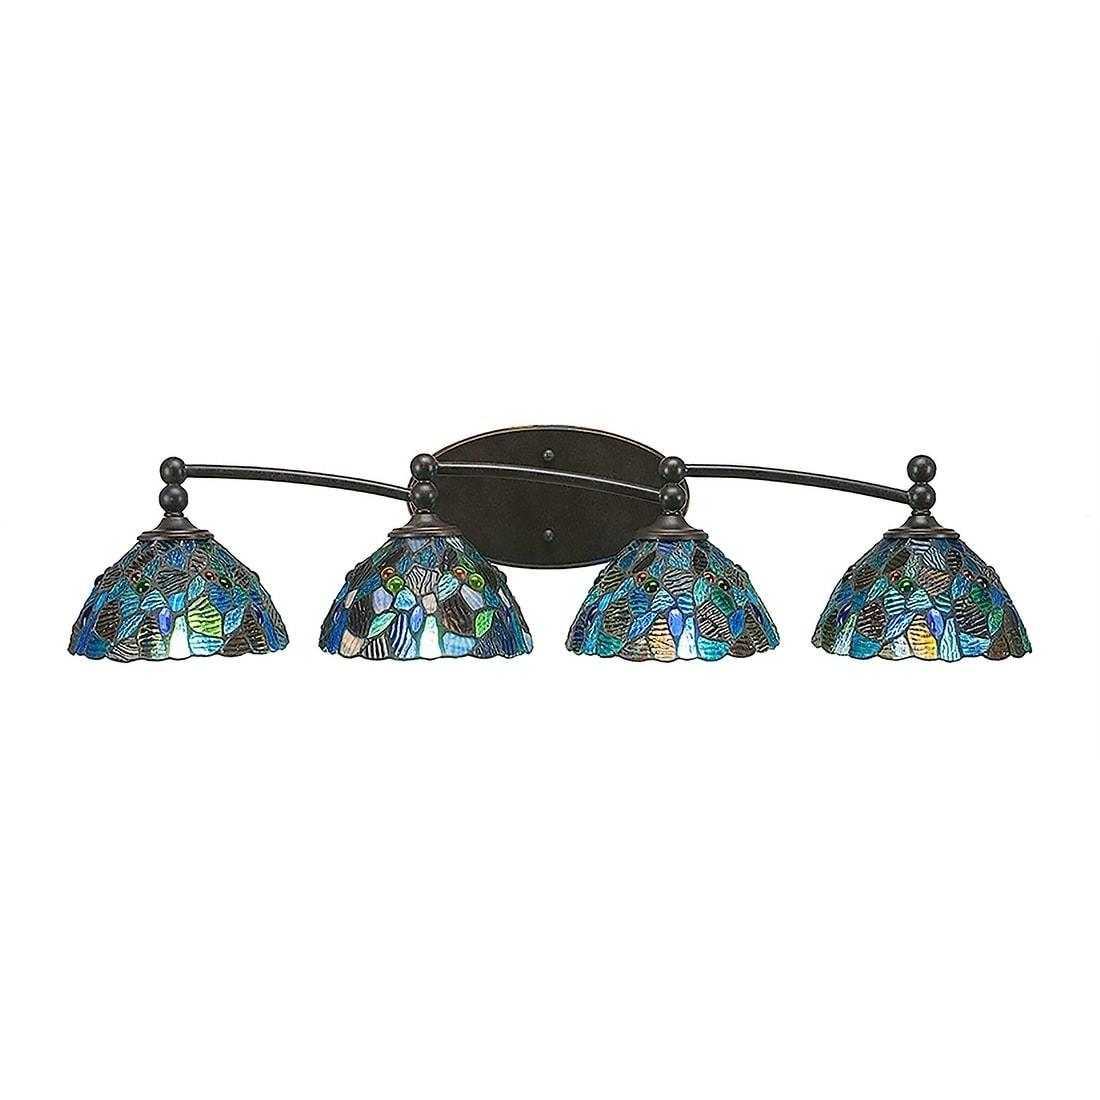 4 Light Bath Vanity Dark Granite Finish With 7 Blue Mosaic Tiffany Glass Overstock 20291142